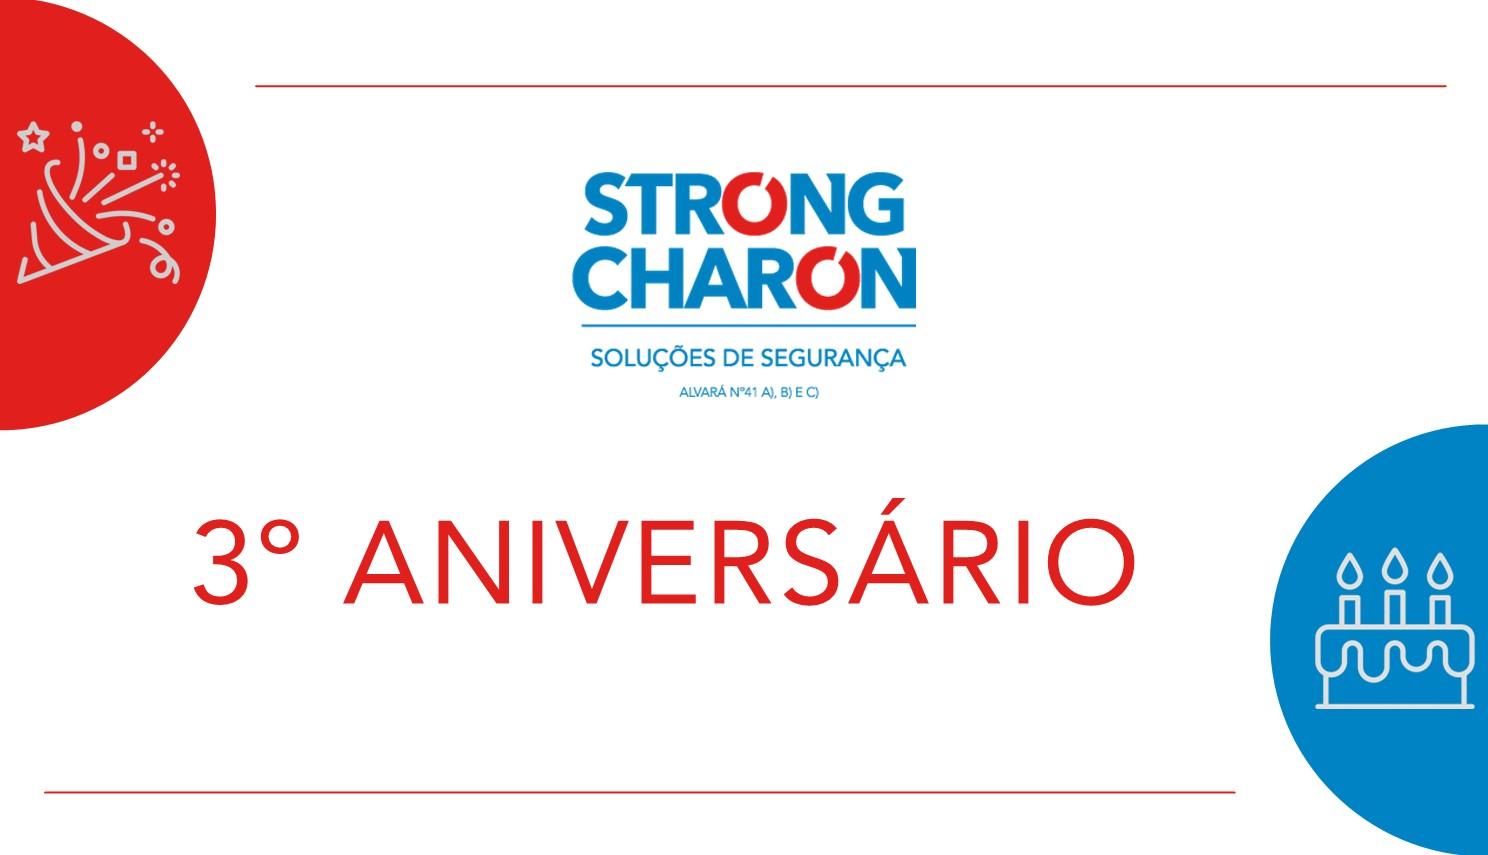 Strong Charon - 3º aniversário